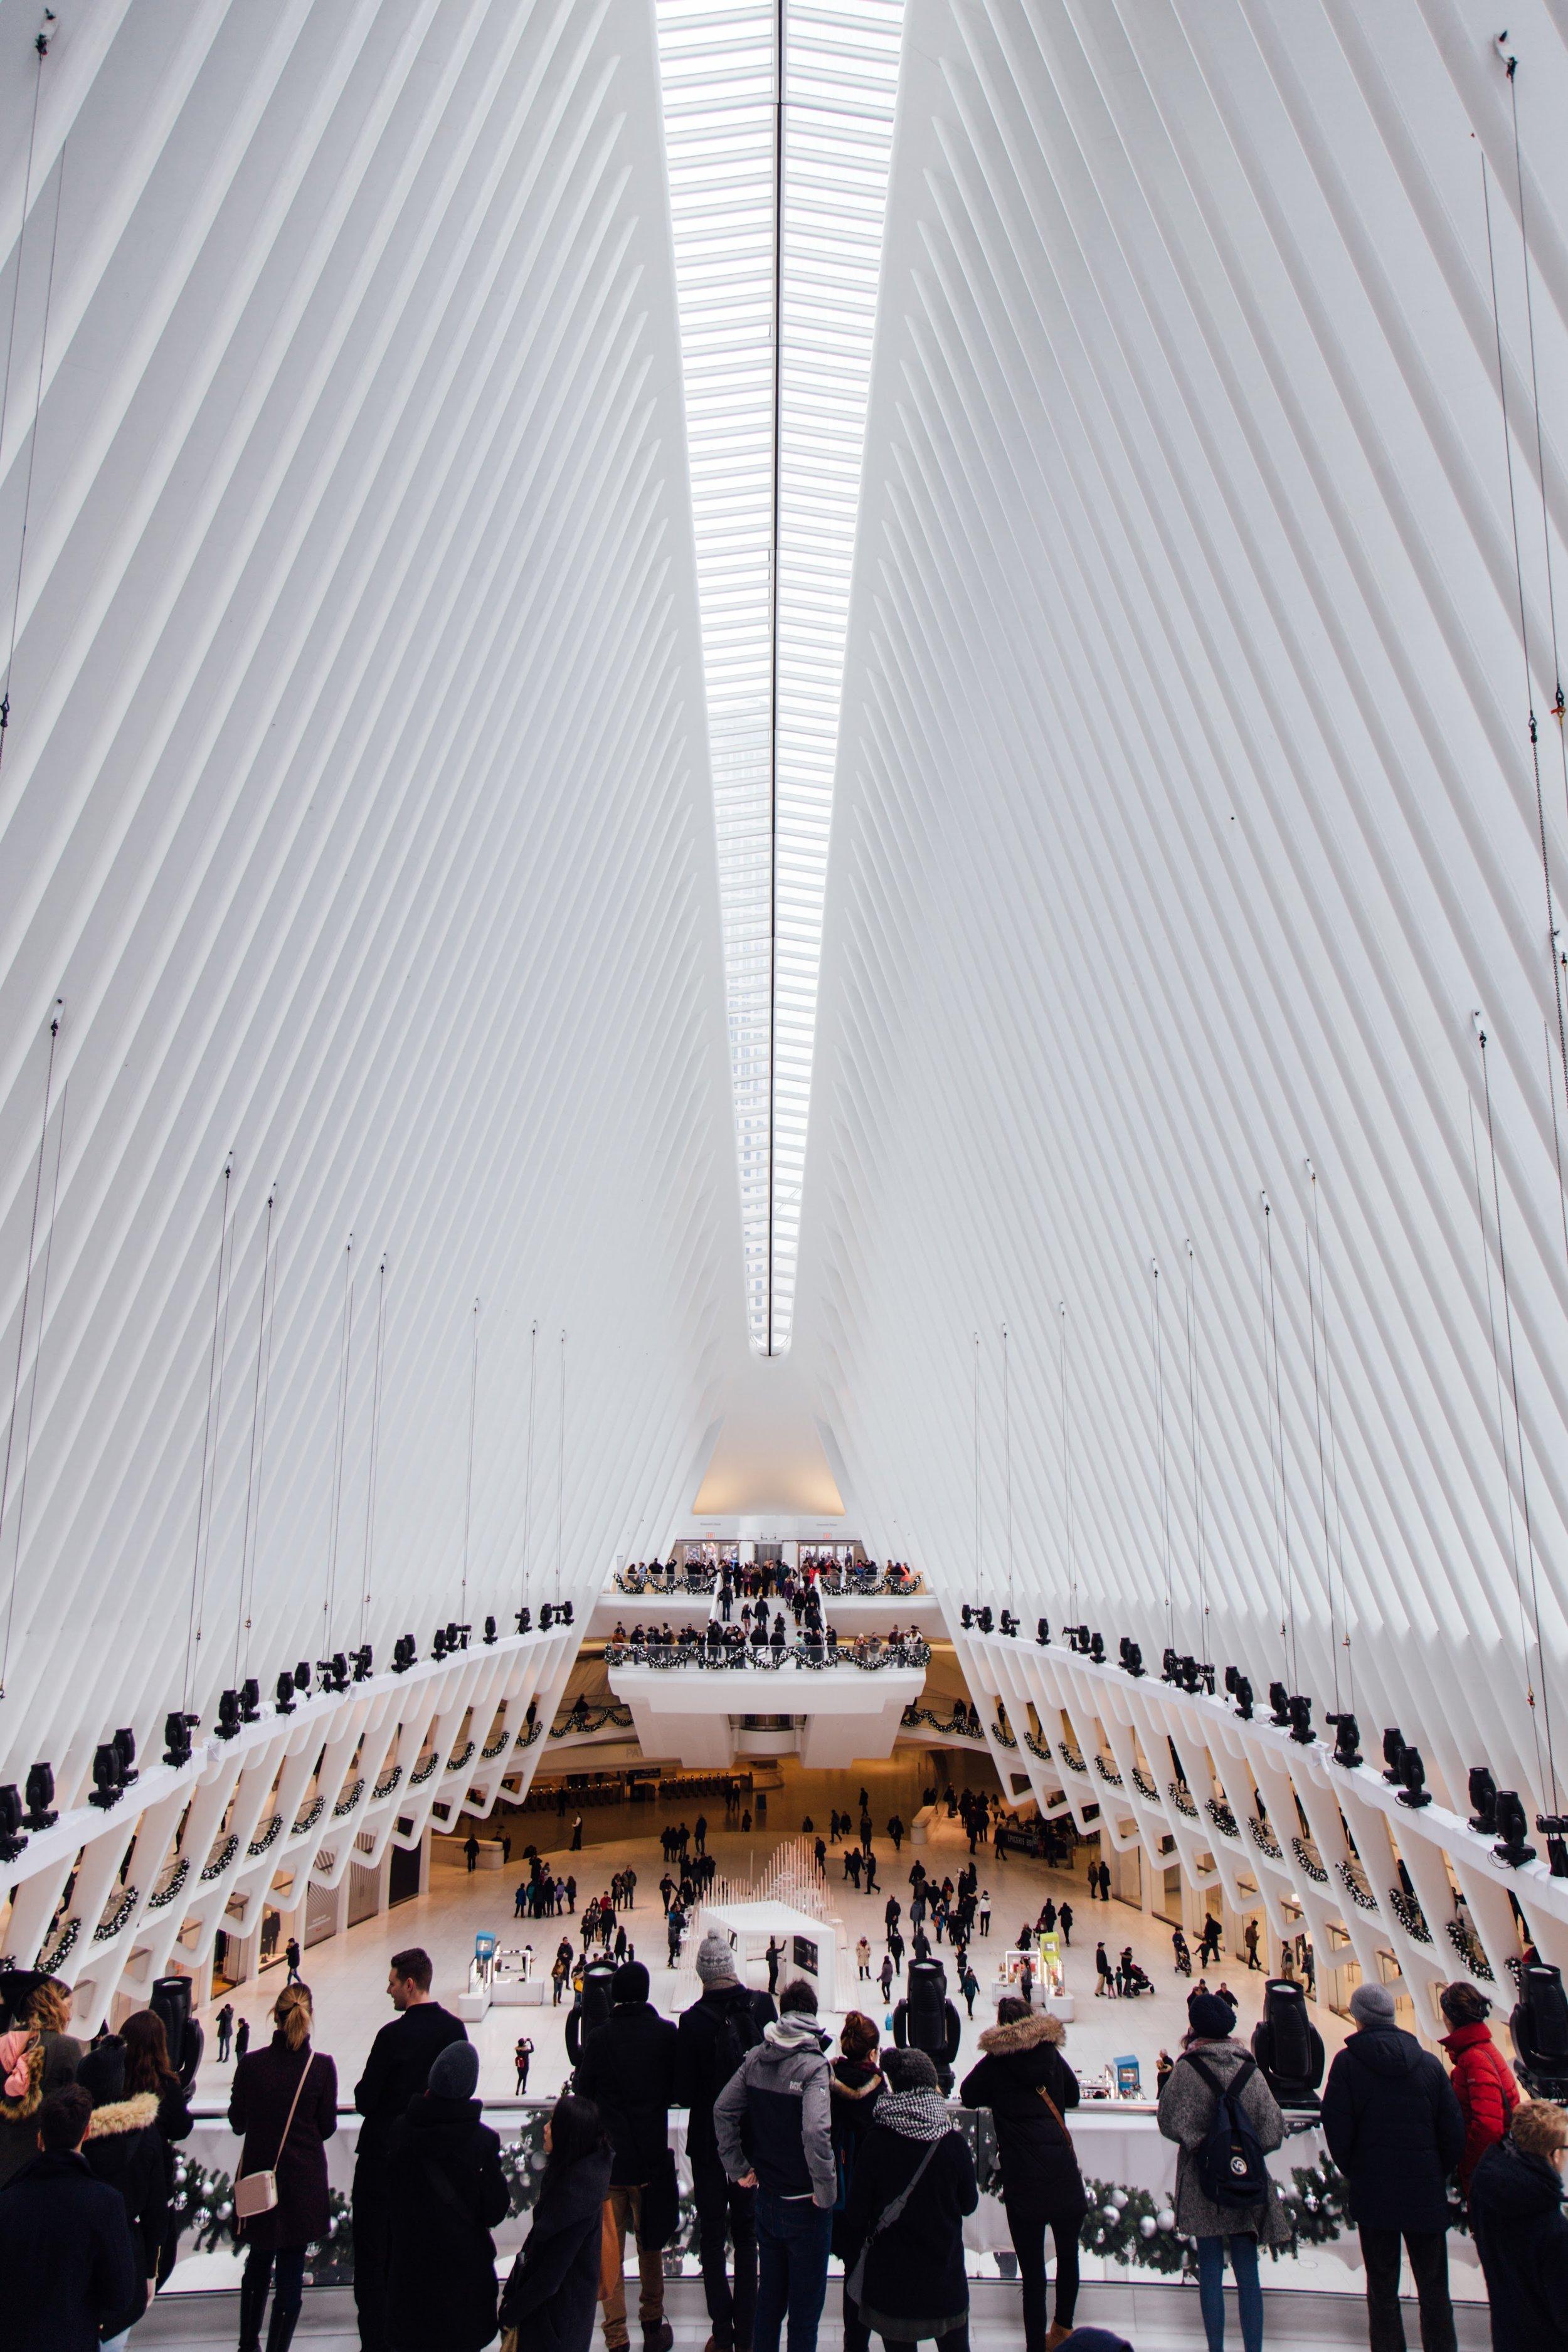 Oculus by Calatrava